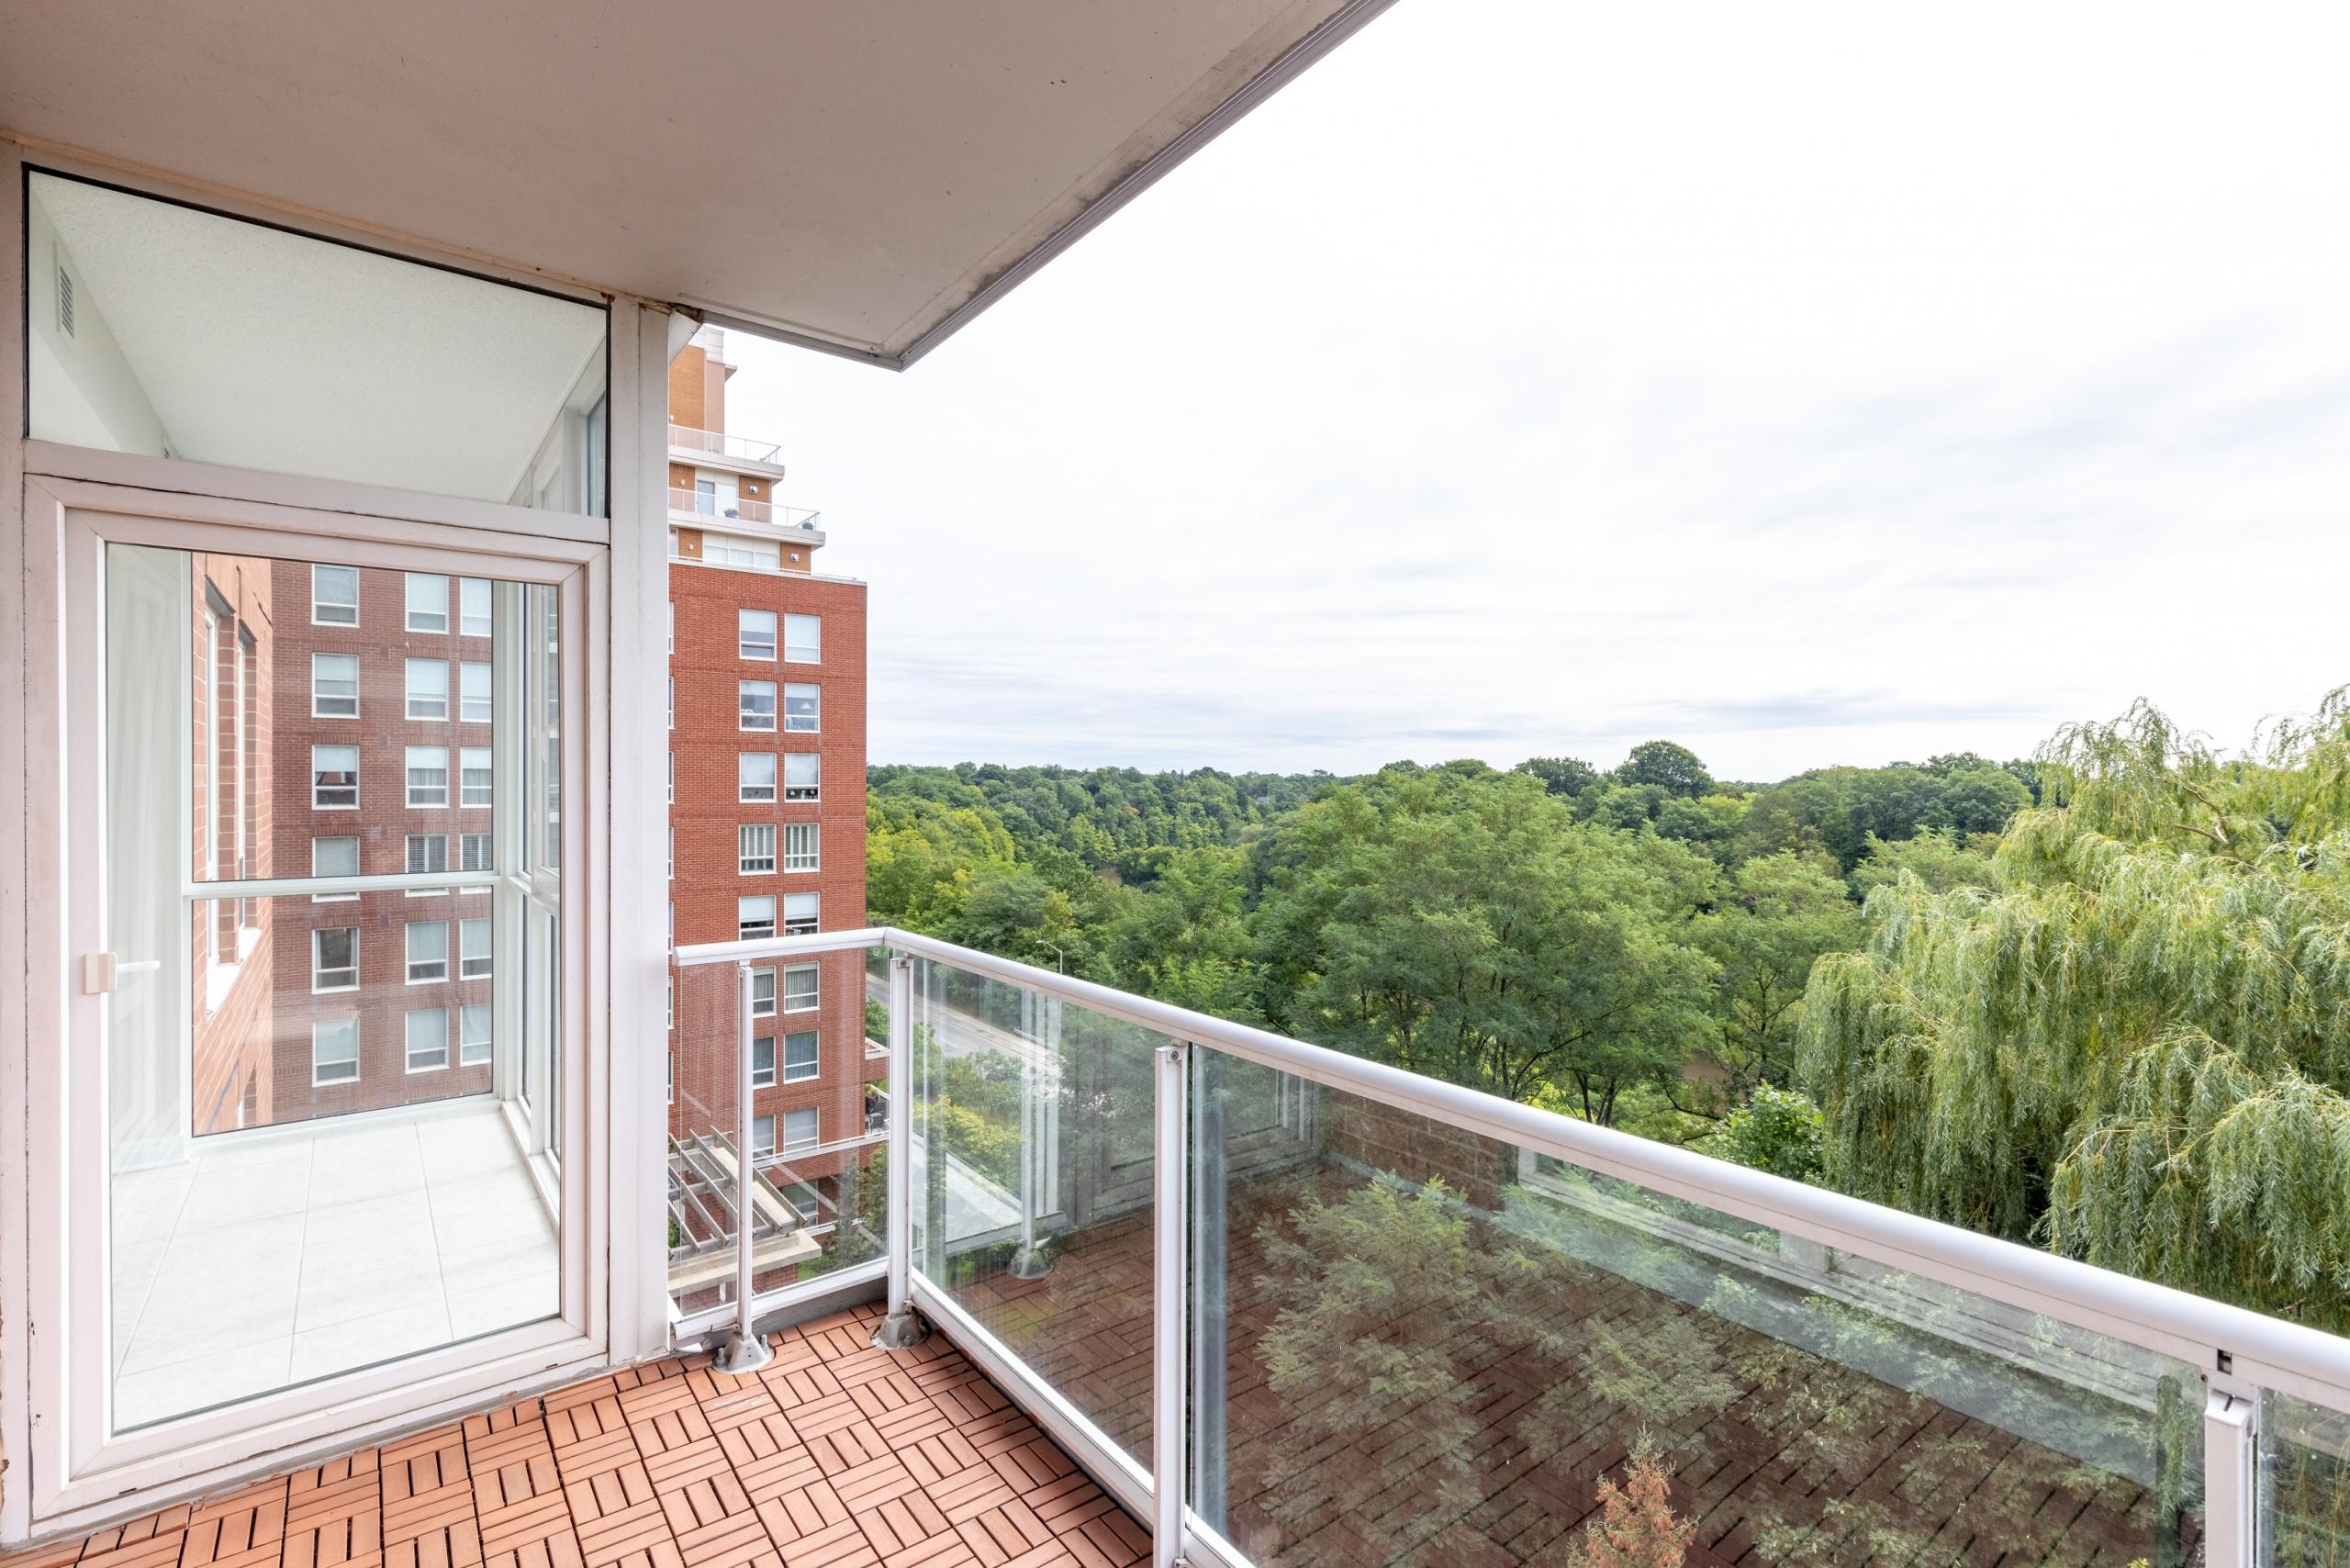 Balcony featured at 508-40 Old Mill Road, Oakville at Alex Irish & Associates